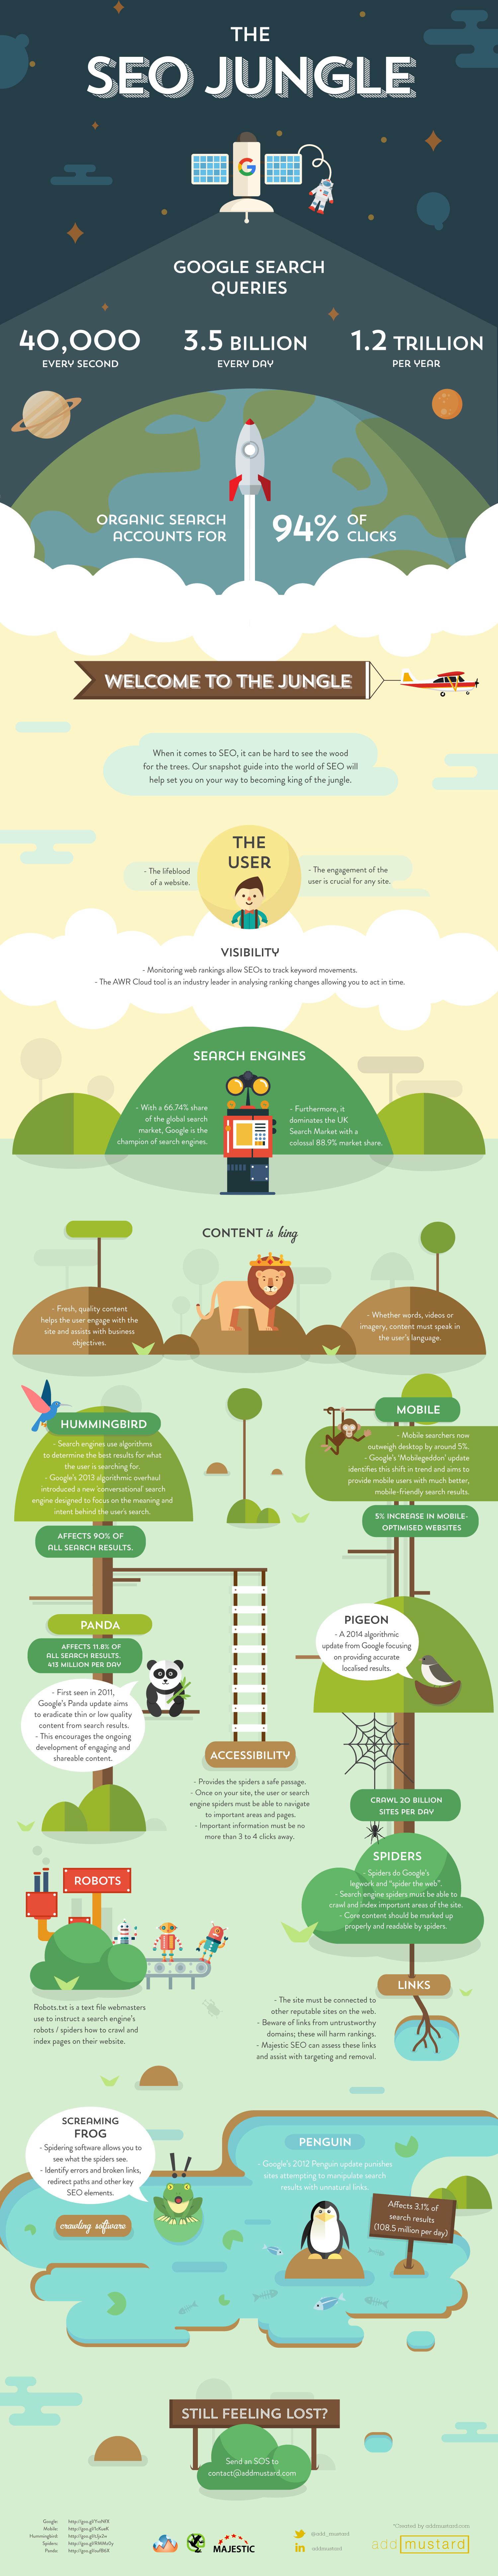 SEO Infographic - addmustard